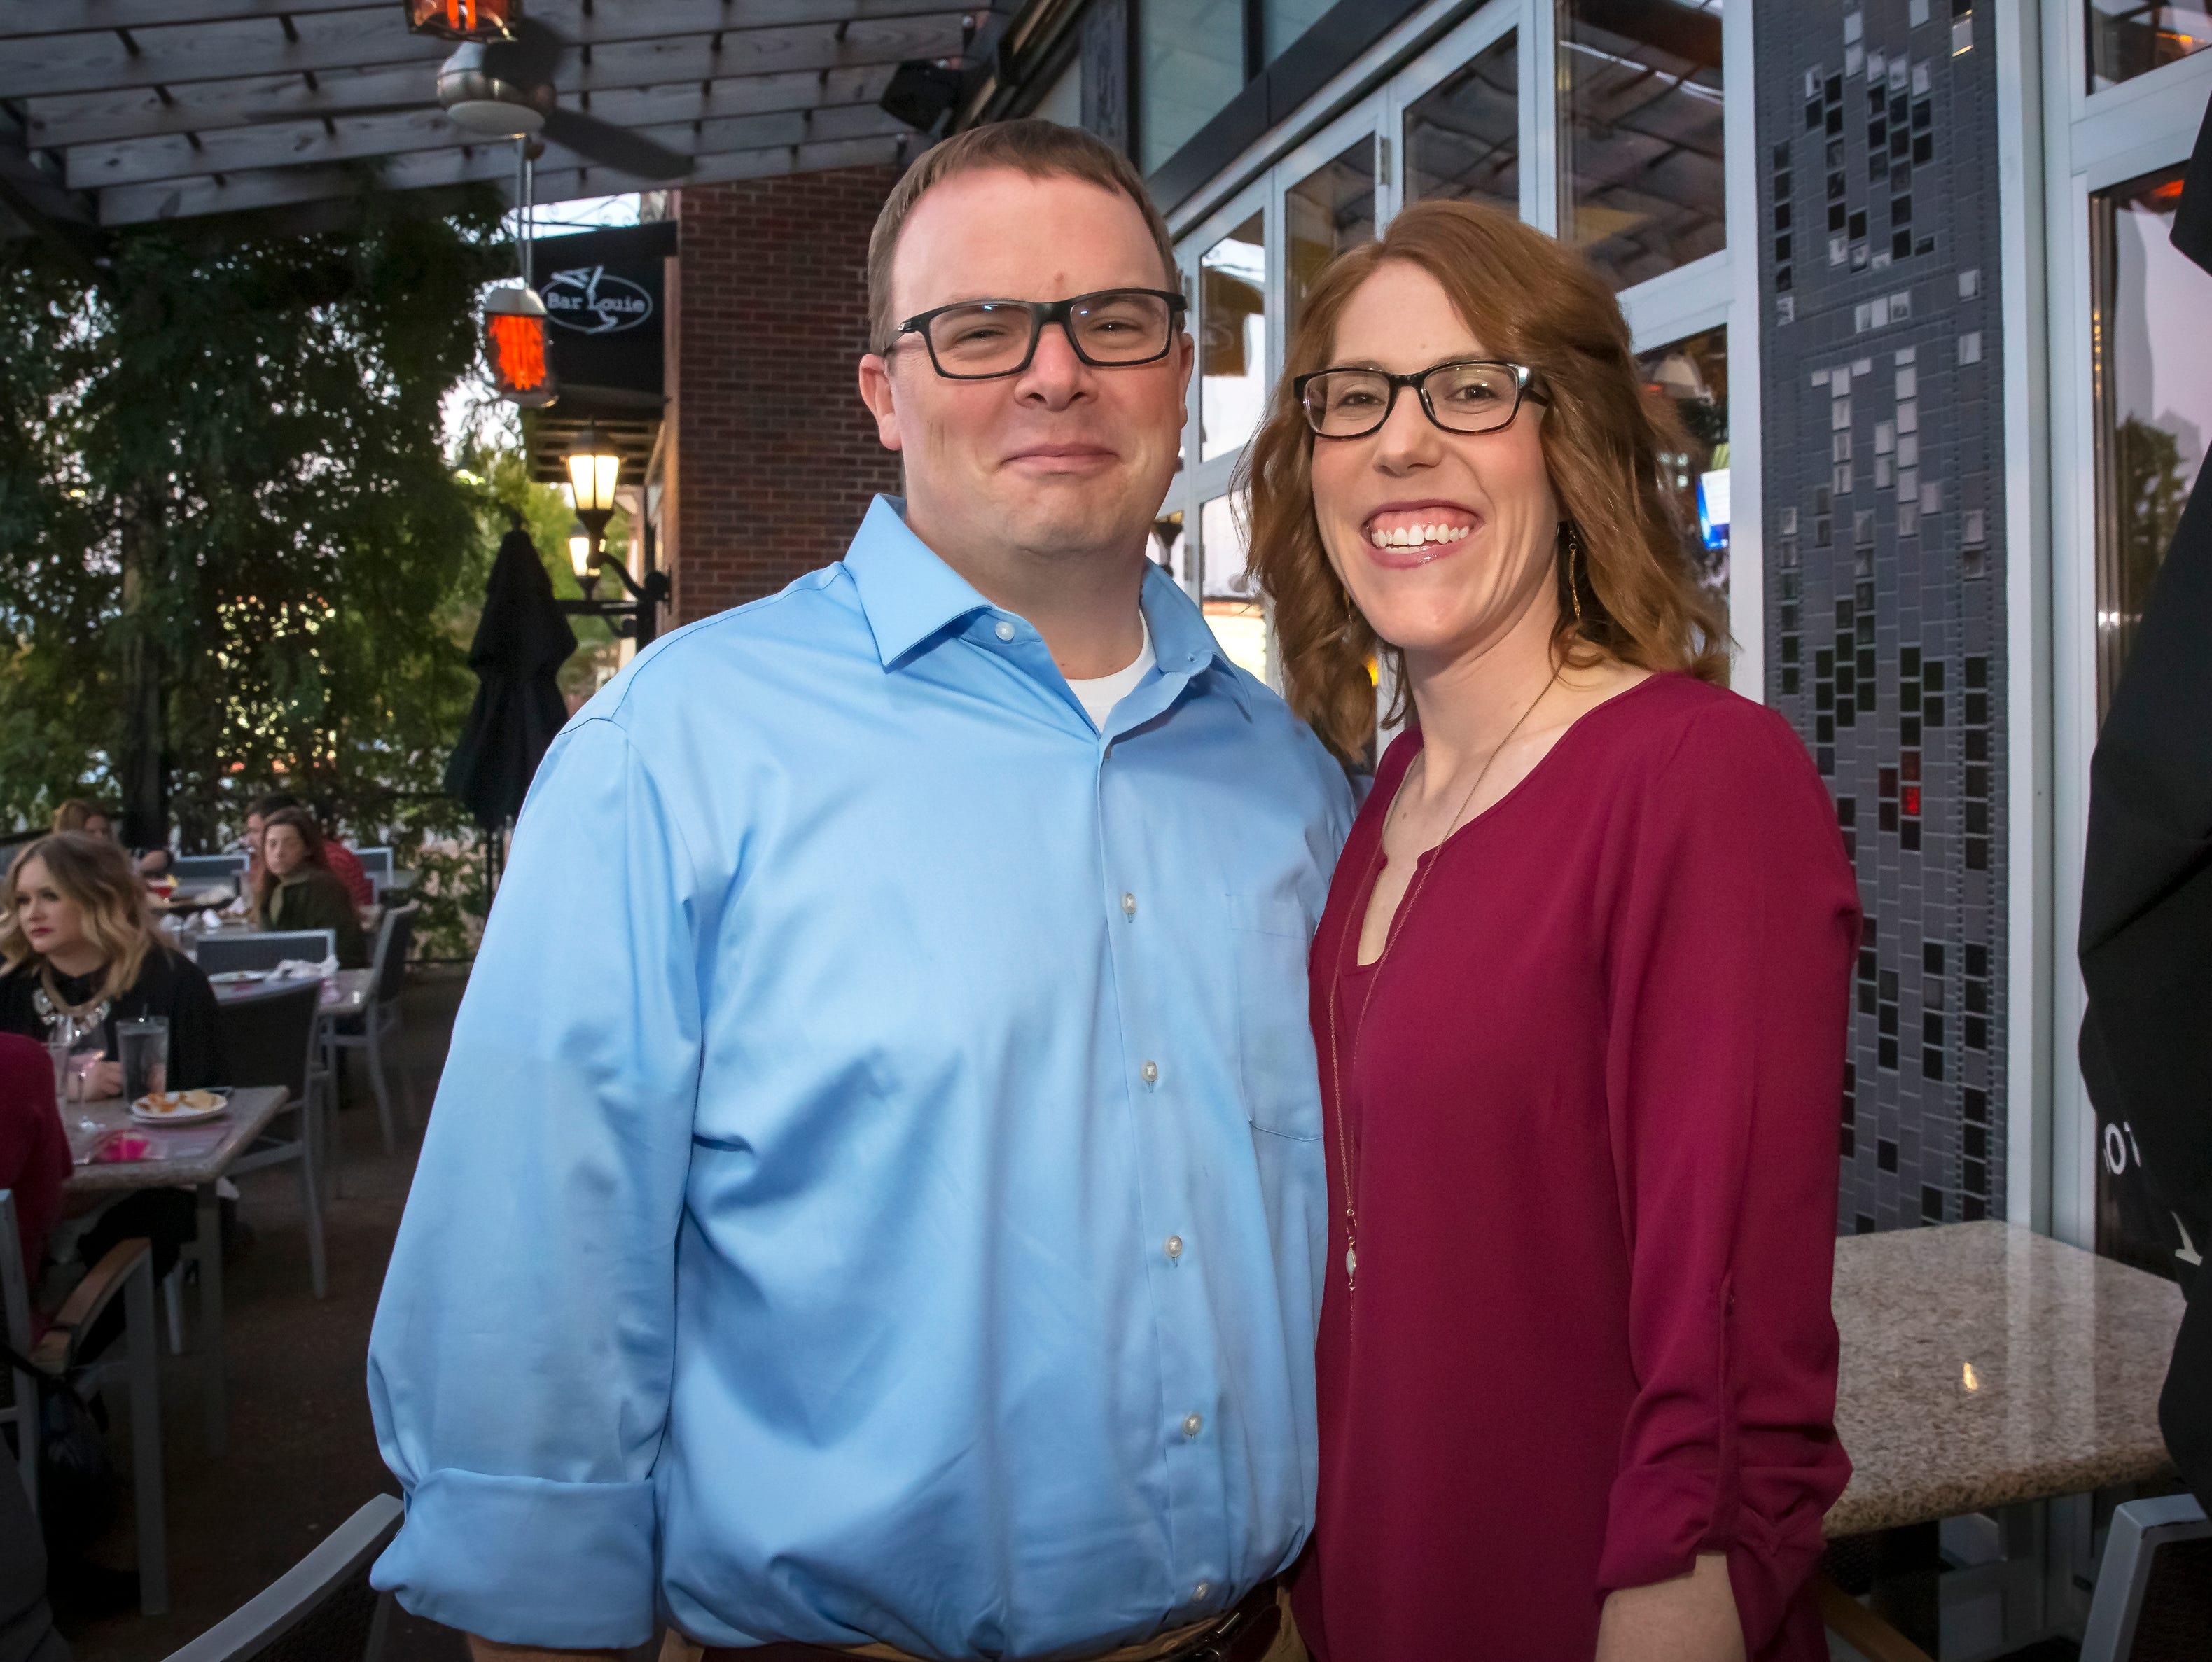 Matt and Kristi Crass at the Murfreesboro Magazine Most Beautiful People event held at Bar Louie.